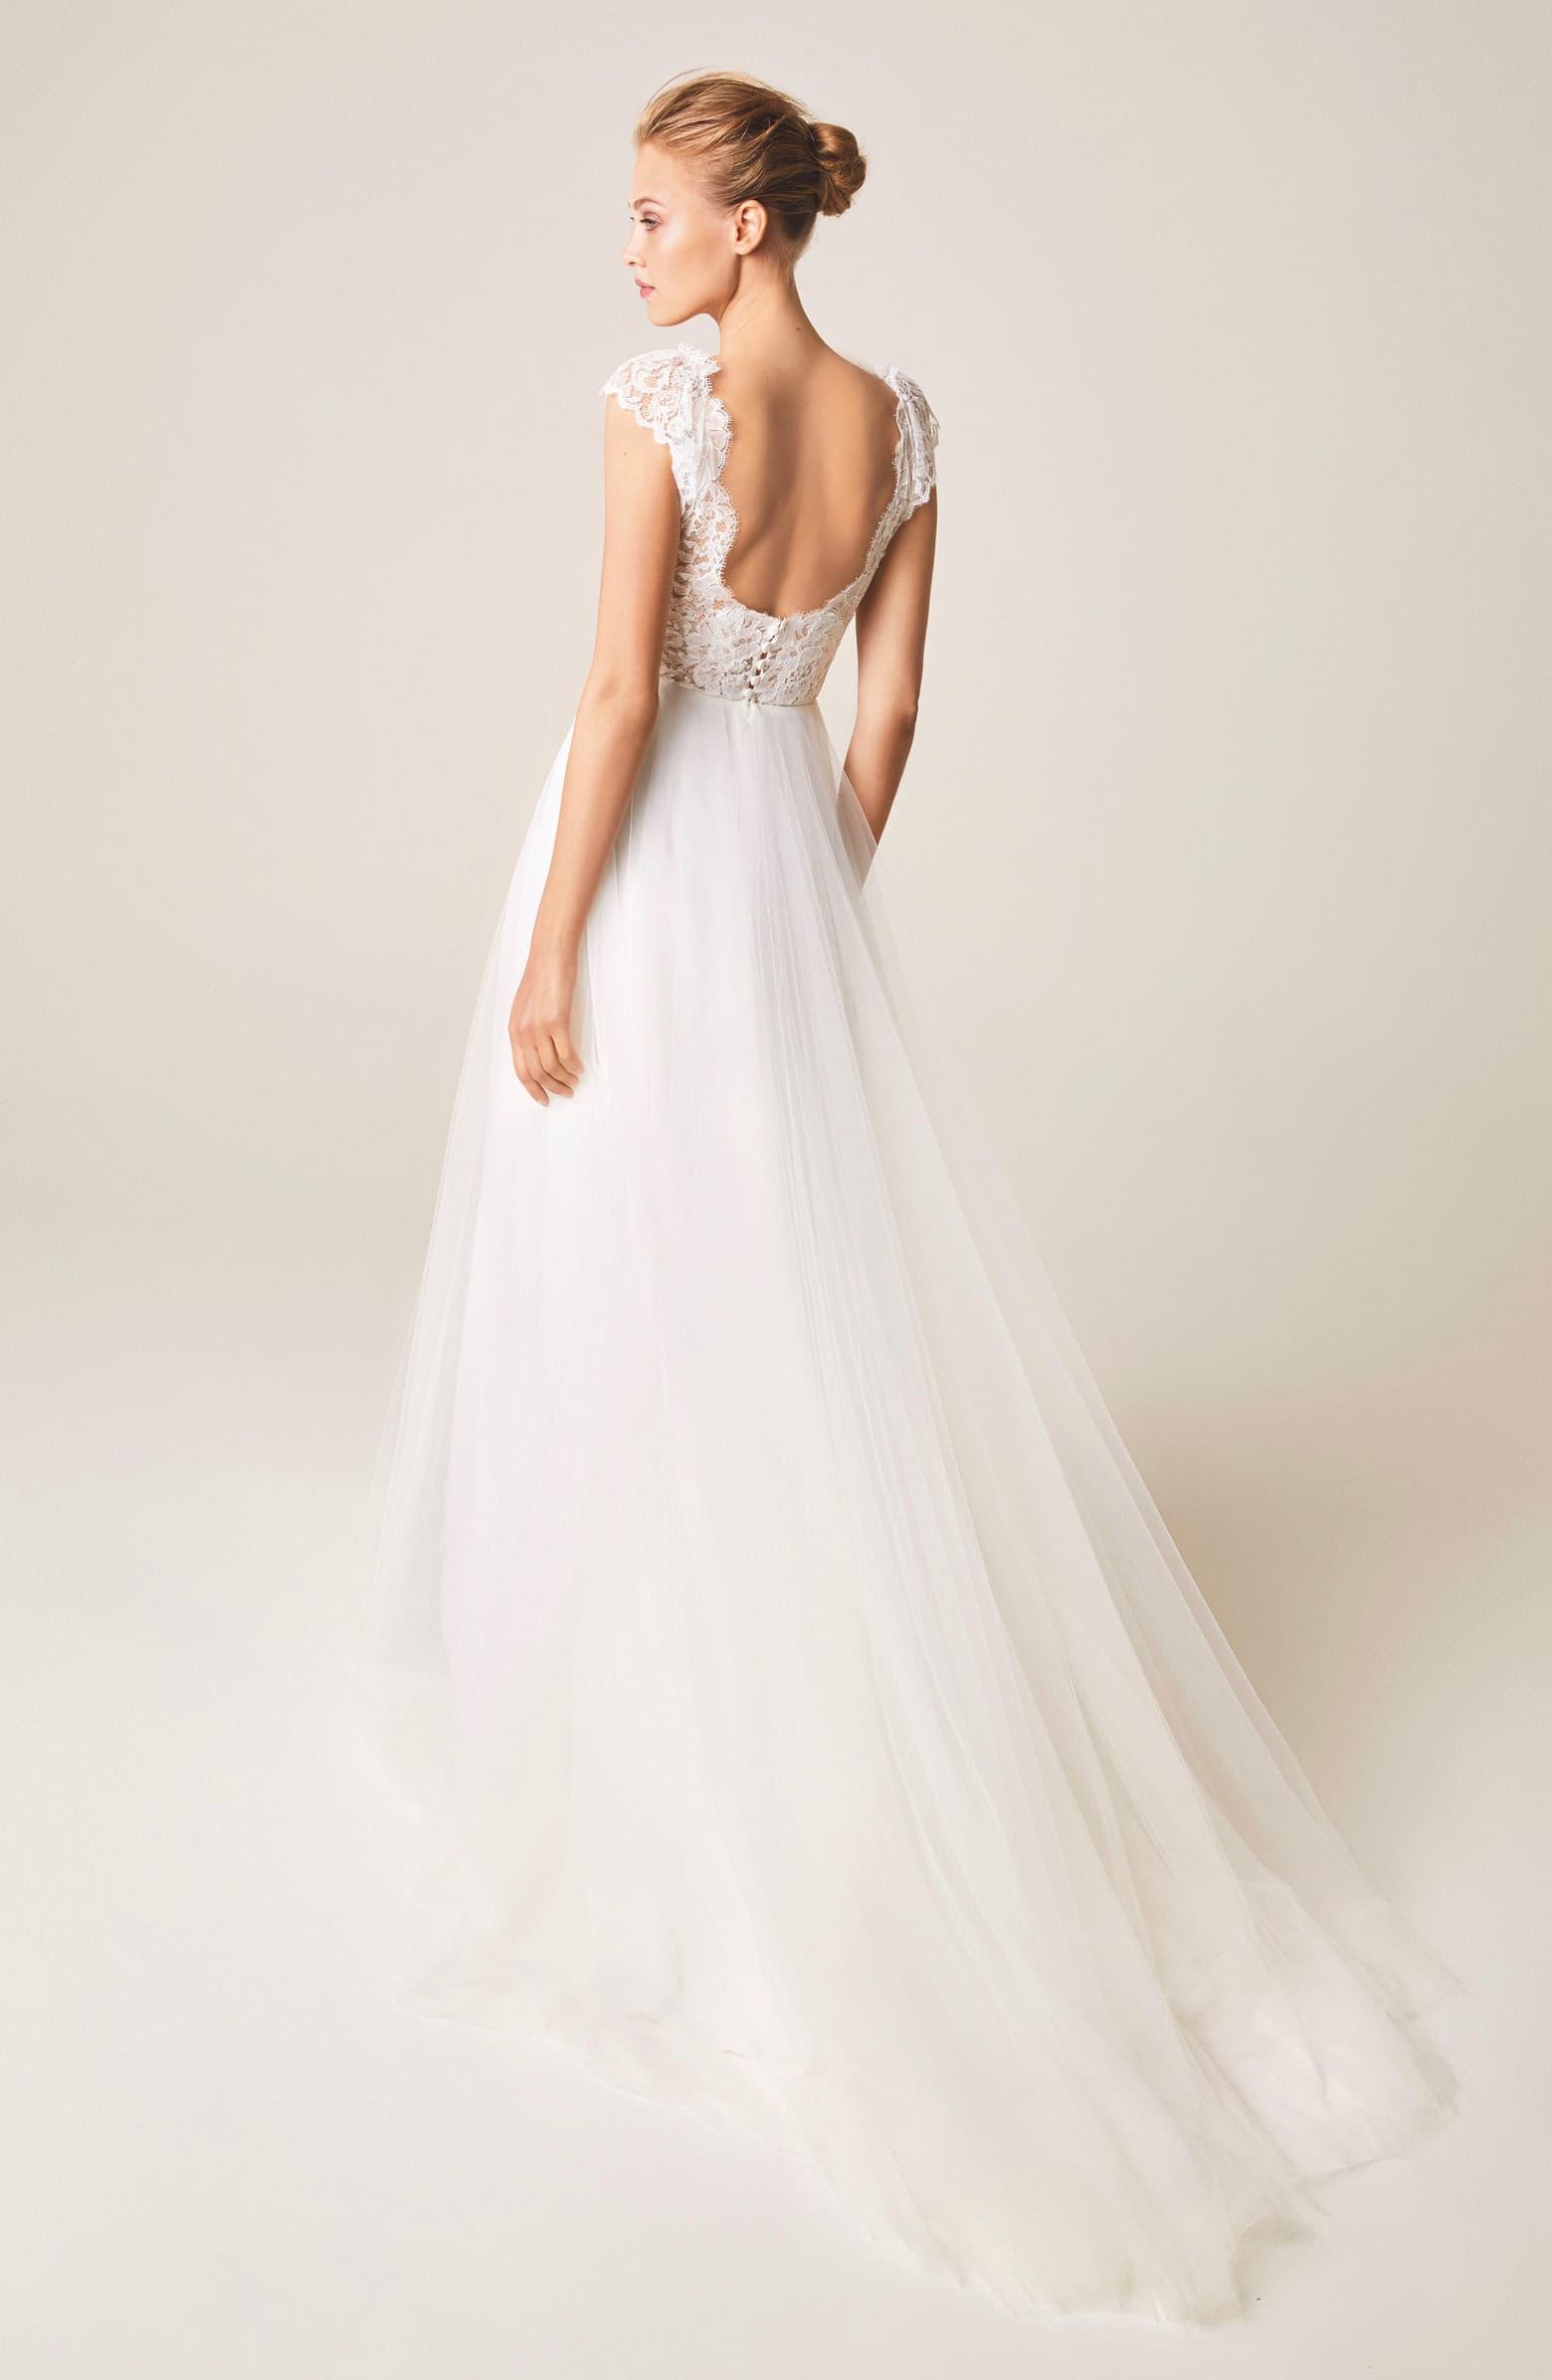 Jesus Peiro V Neck Cap Sleeve Wedding Dress Nordstrom Wedding Dress Cap Sleeves Wedding Cap Sleeves Wedding Dresses Lace